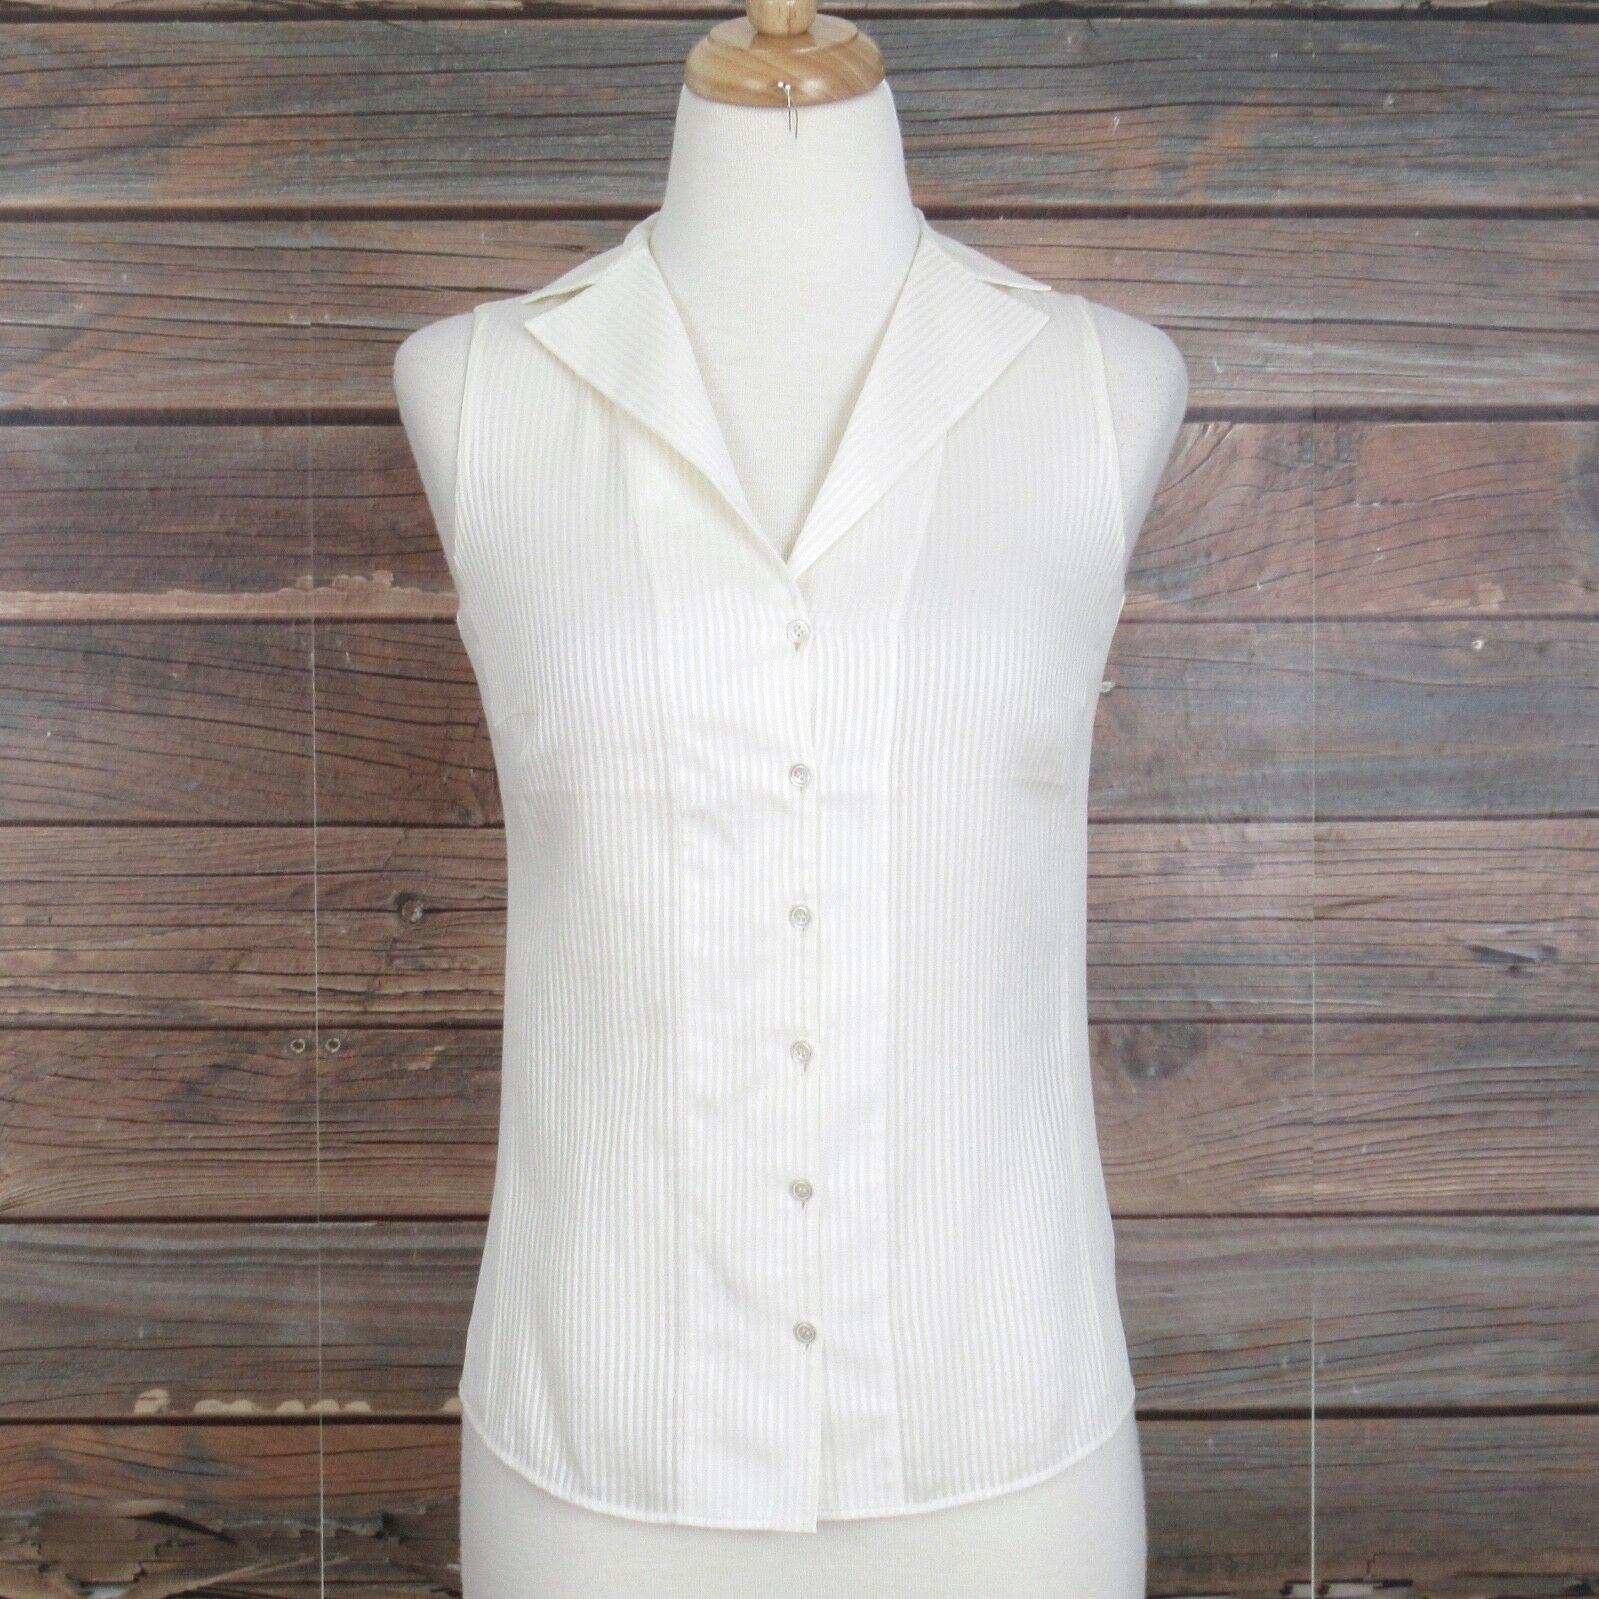 AKRIS PUNTO Weiß Shadow Stripe Button Down Sleeveless Shirt Top. 4